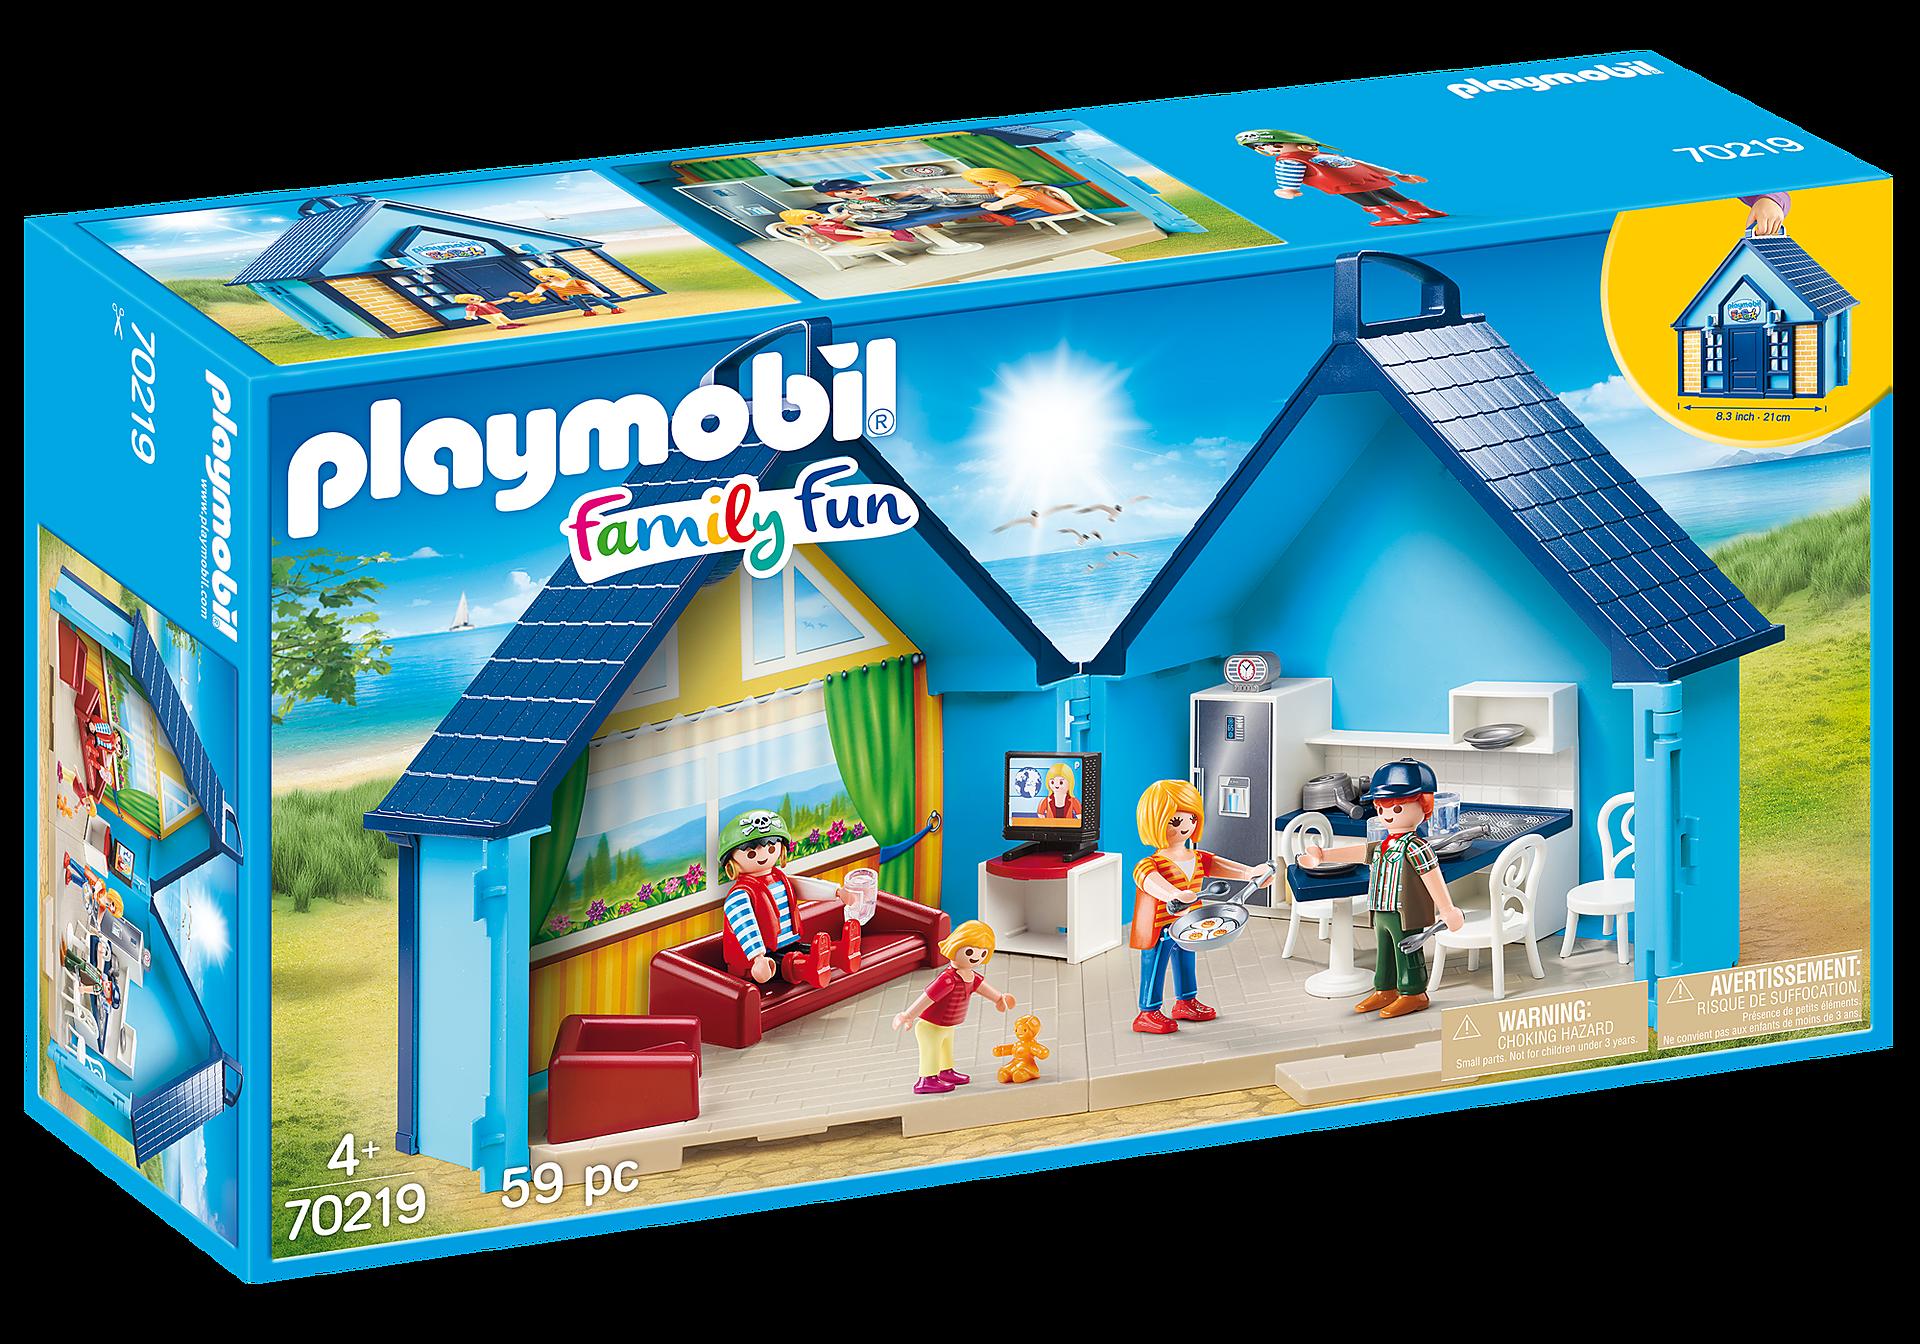 http://media.playmobil.com/i/playmobil/70219_product_box_front/PLAYMOBIL-FunPark Aufklapp-Ferienhaus